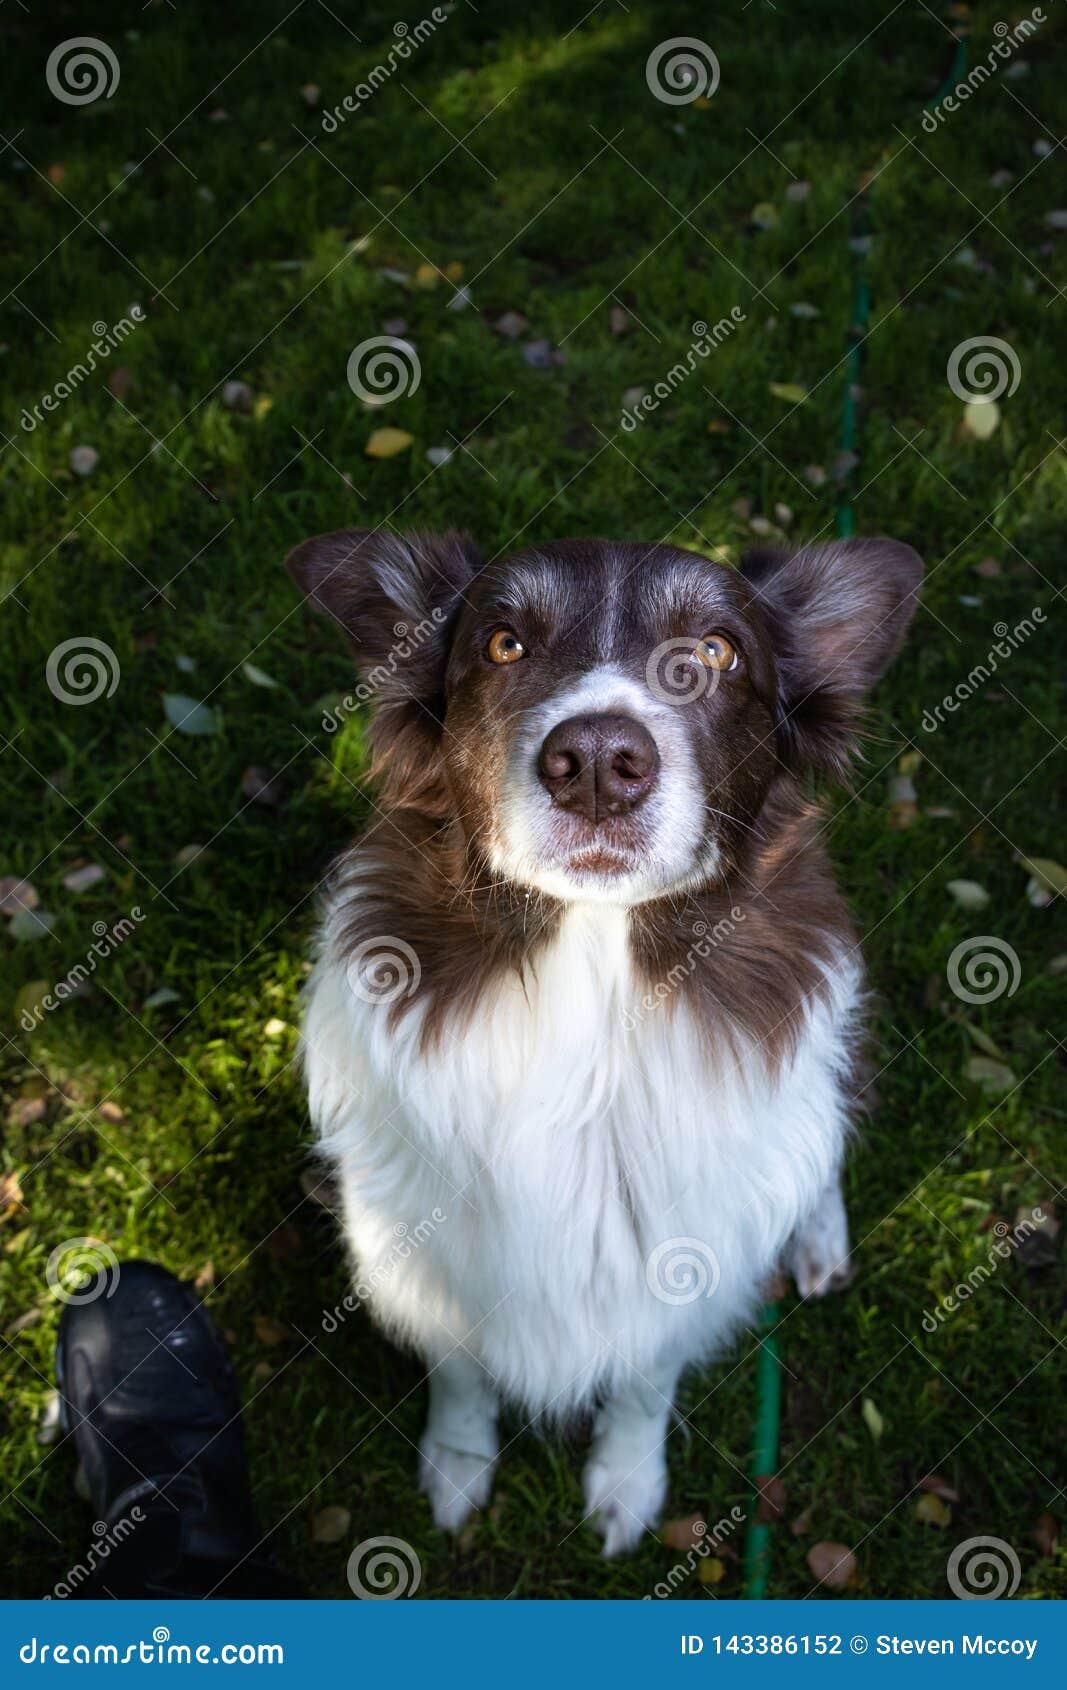 Aussie Australian Shepherd Border Collie väntar tålmodigt på fest